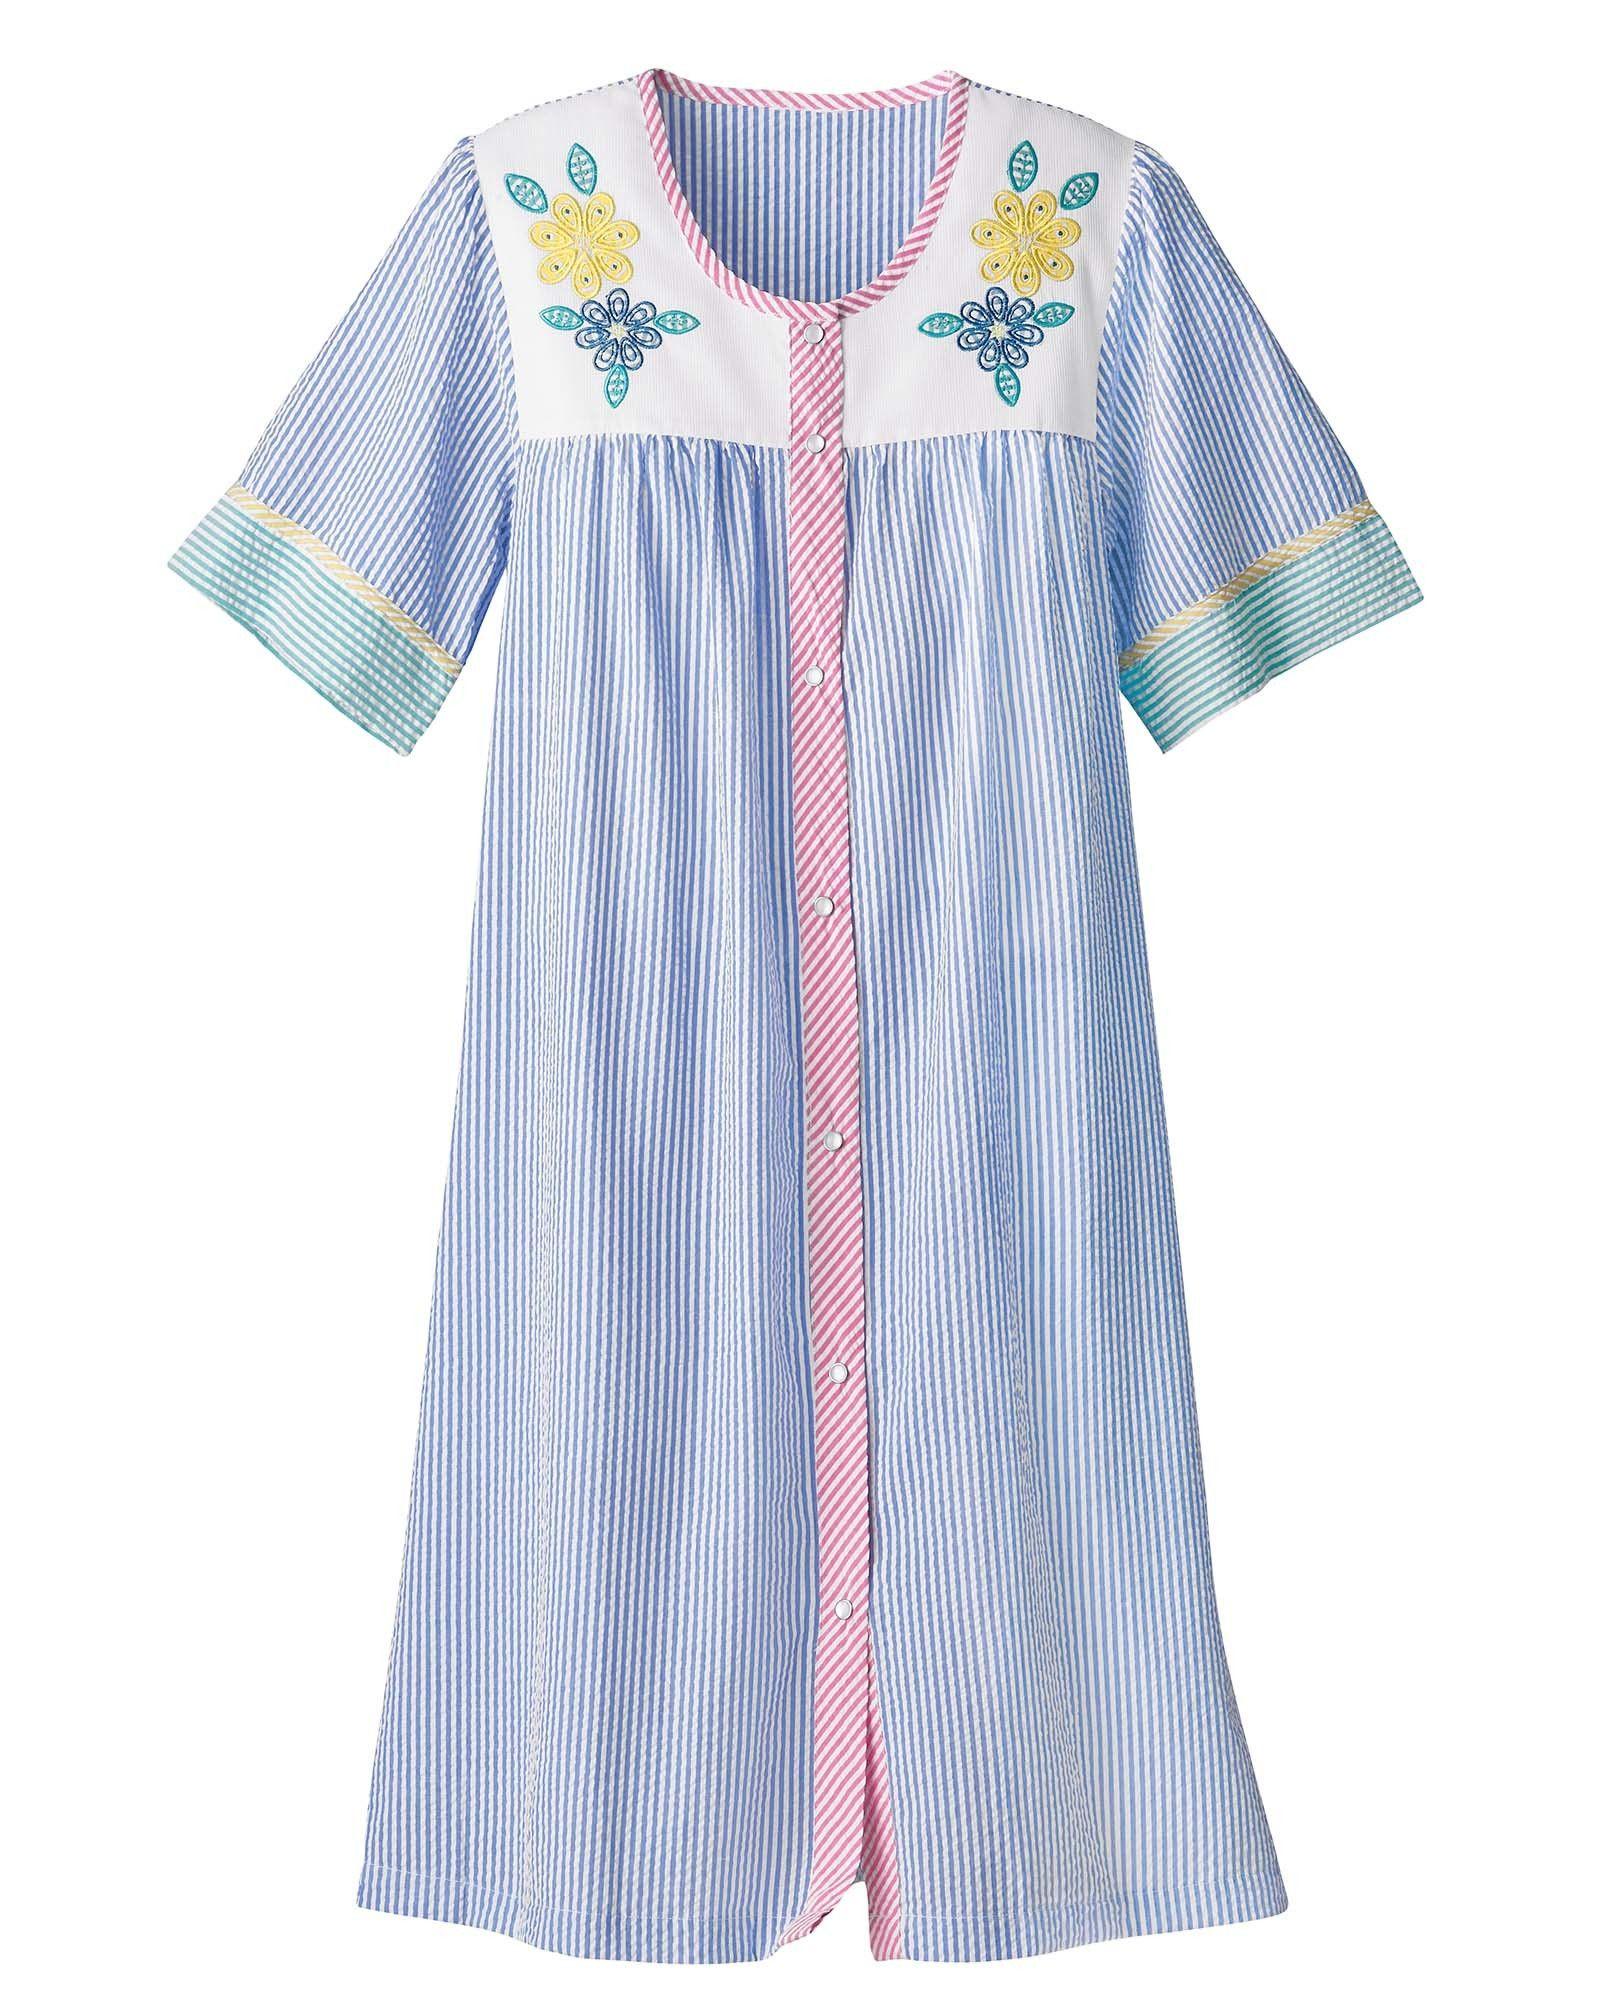 Seersucker House Coat Housecoat House Coat Pattern Nightgowns